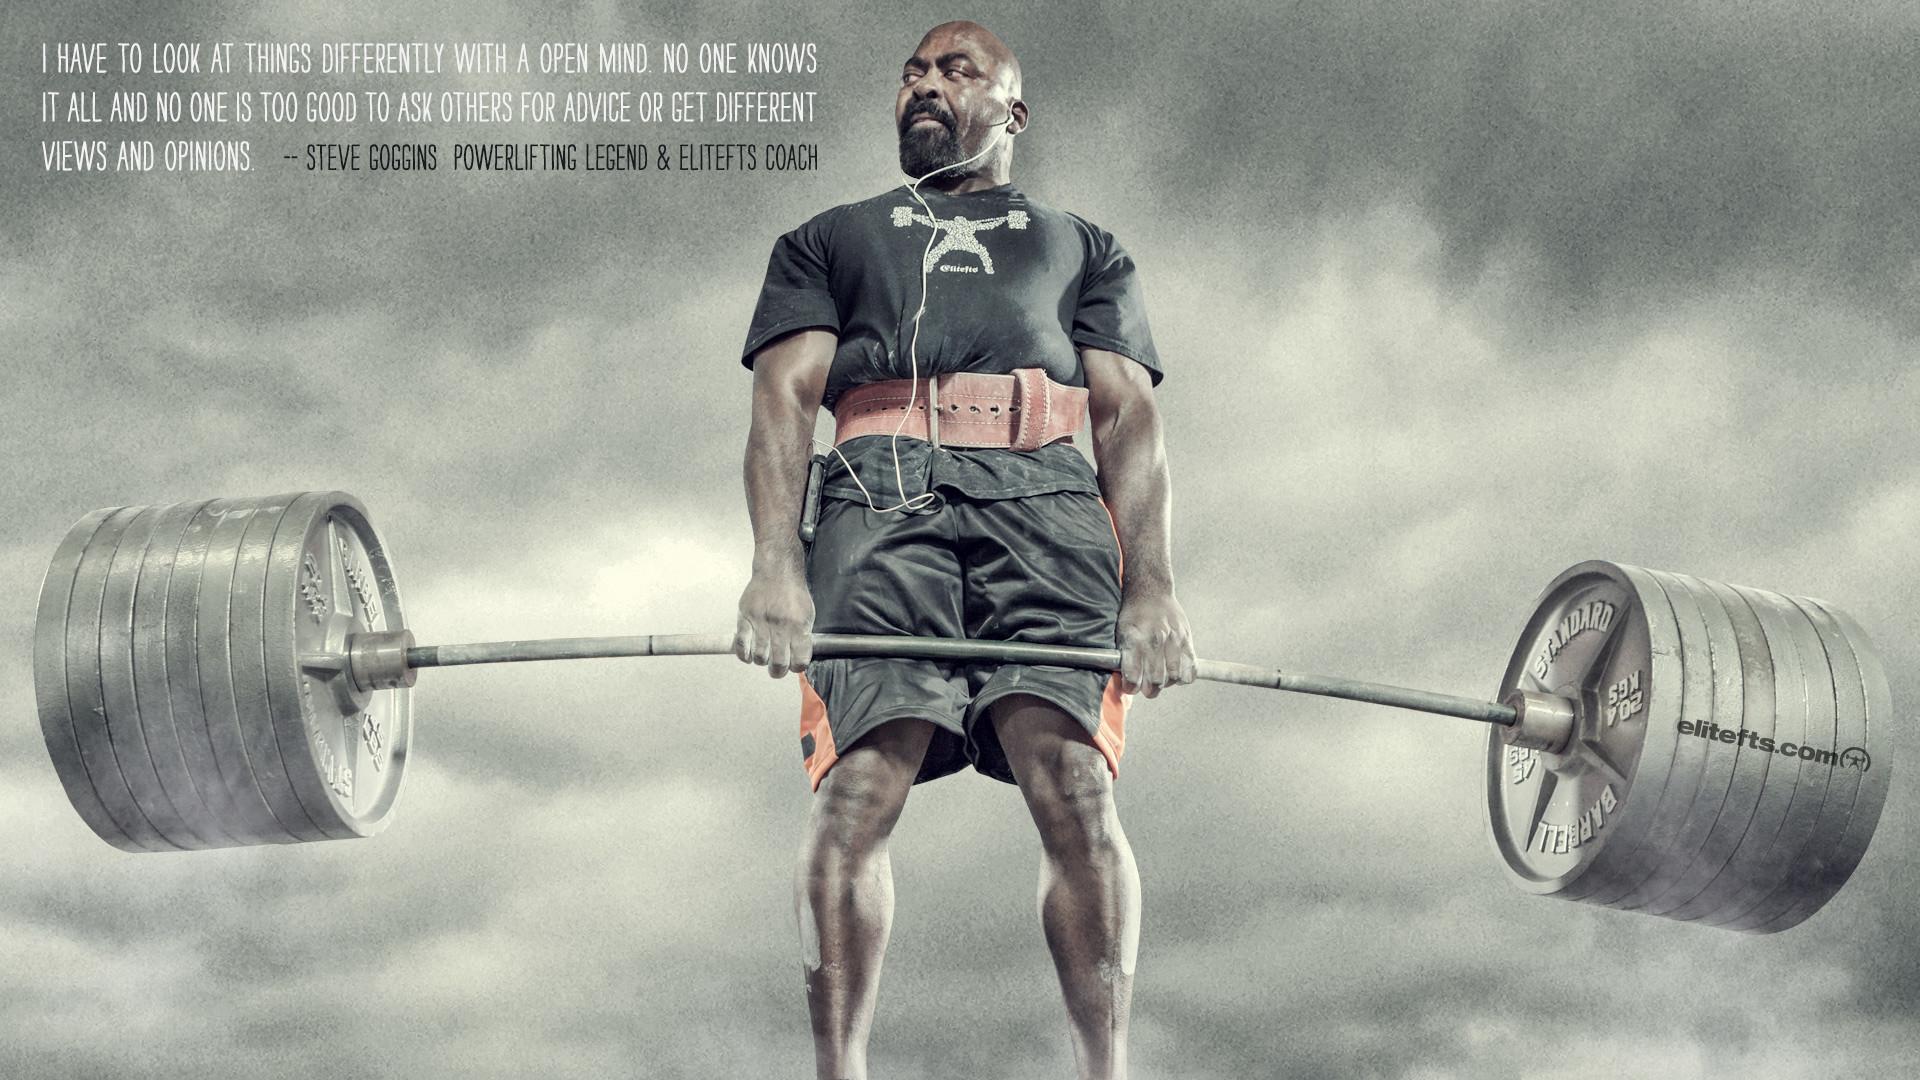 … desktop wallpapers elite fts; weightlifting wallpaper wallpaper;  powerlifting …